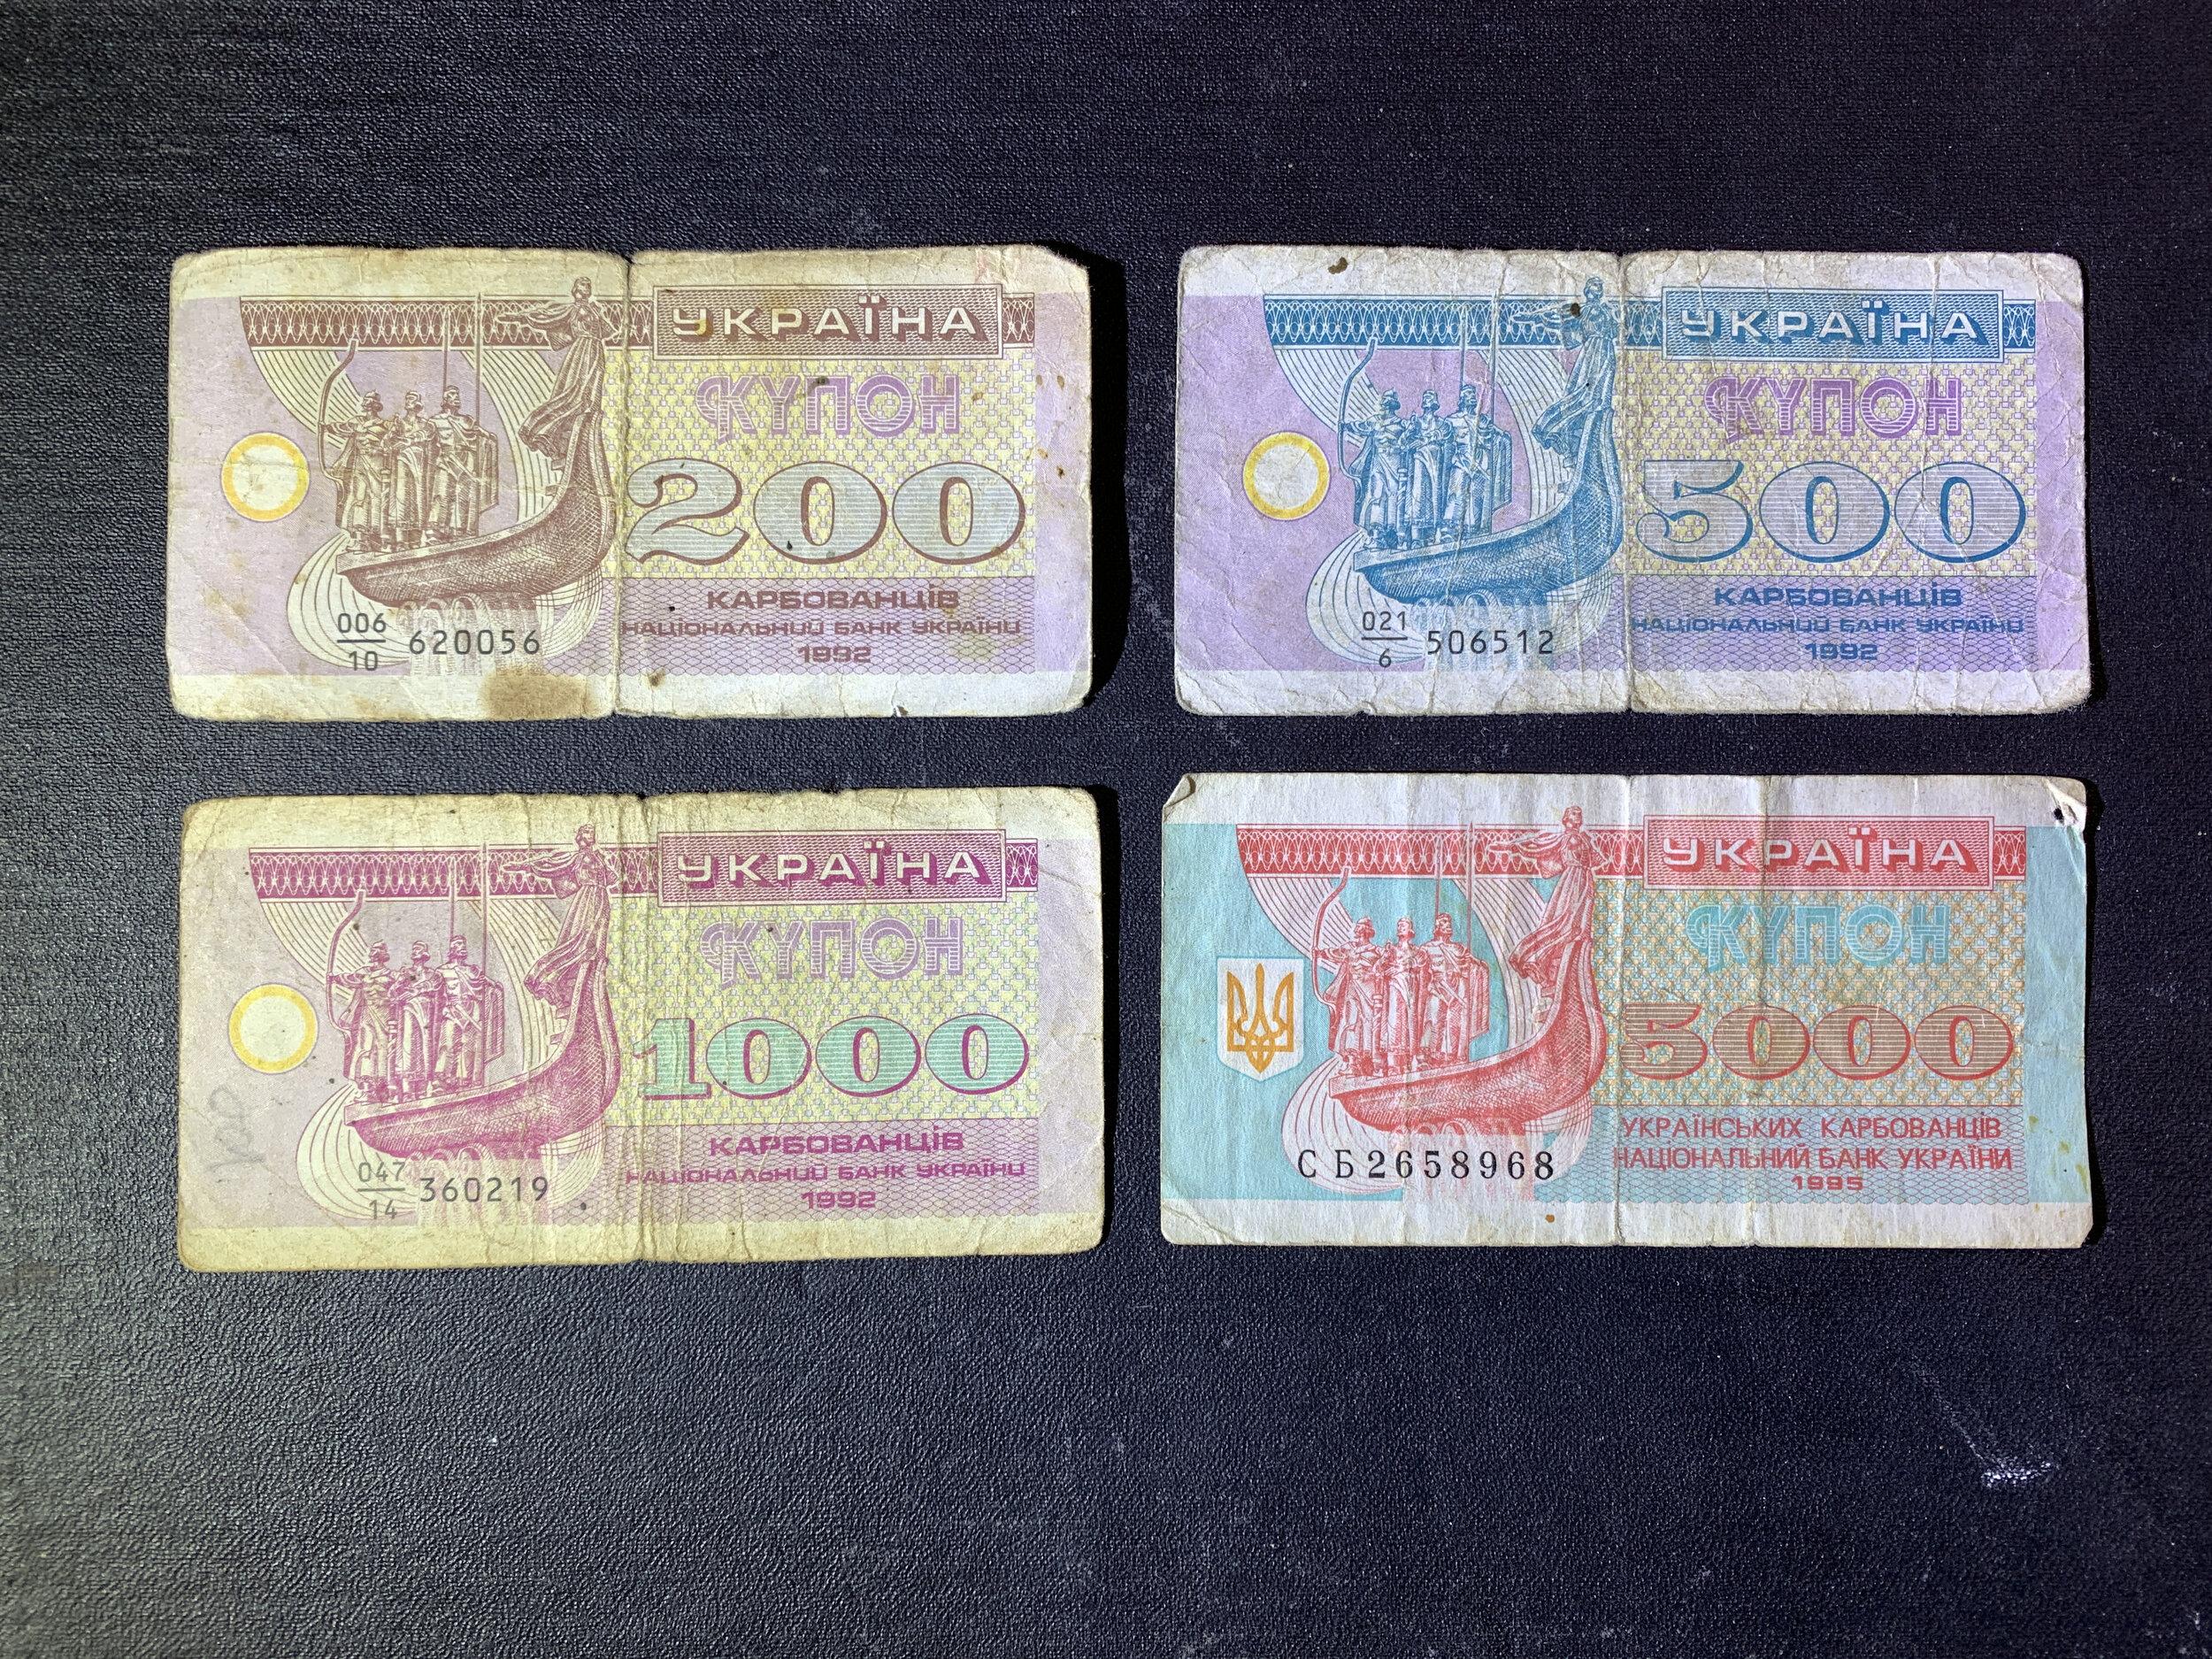 A predecessor currency of today's Ukrainian hryvnia, circa 1992 & 1995